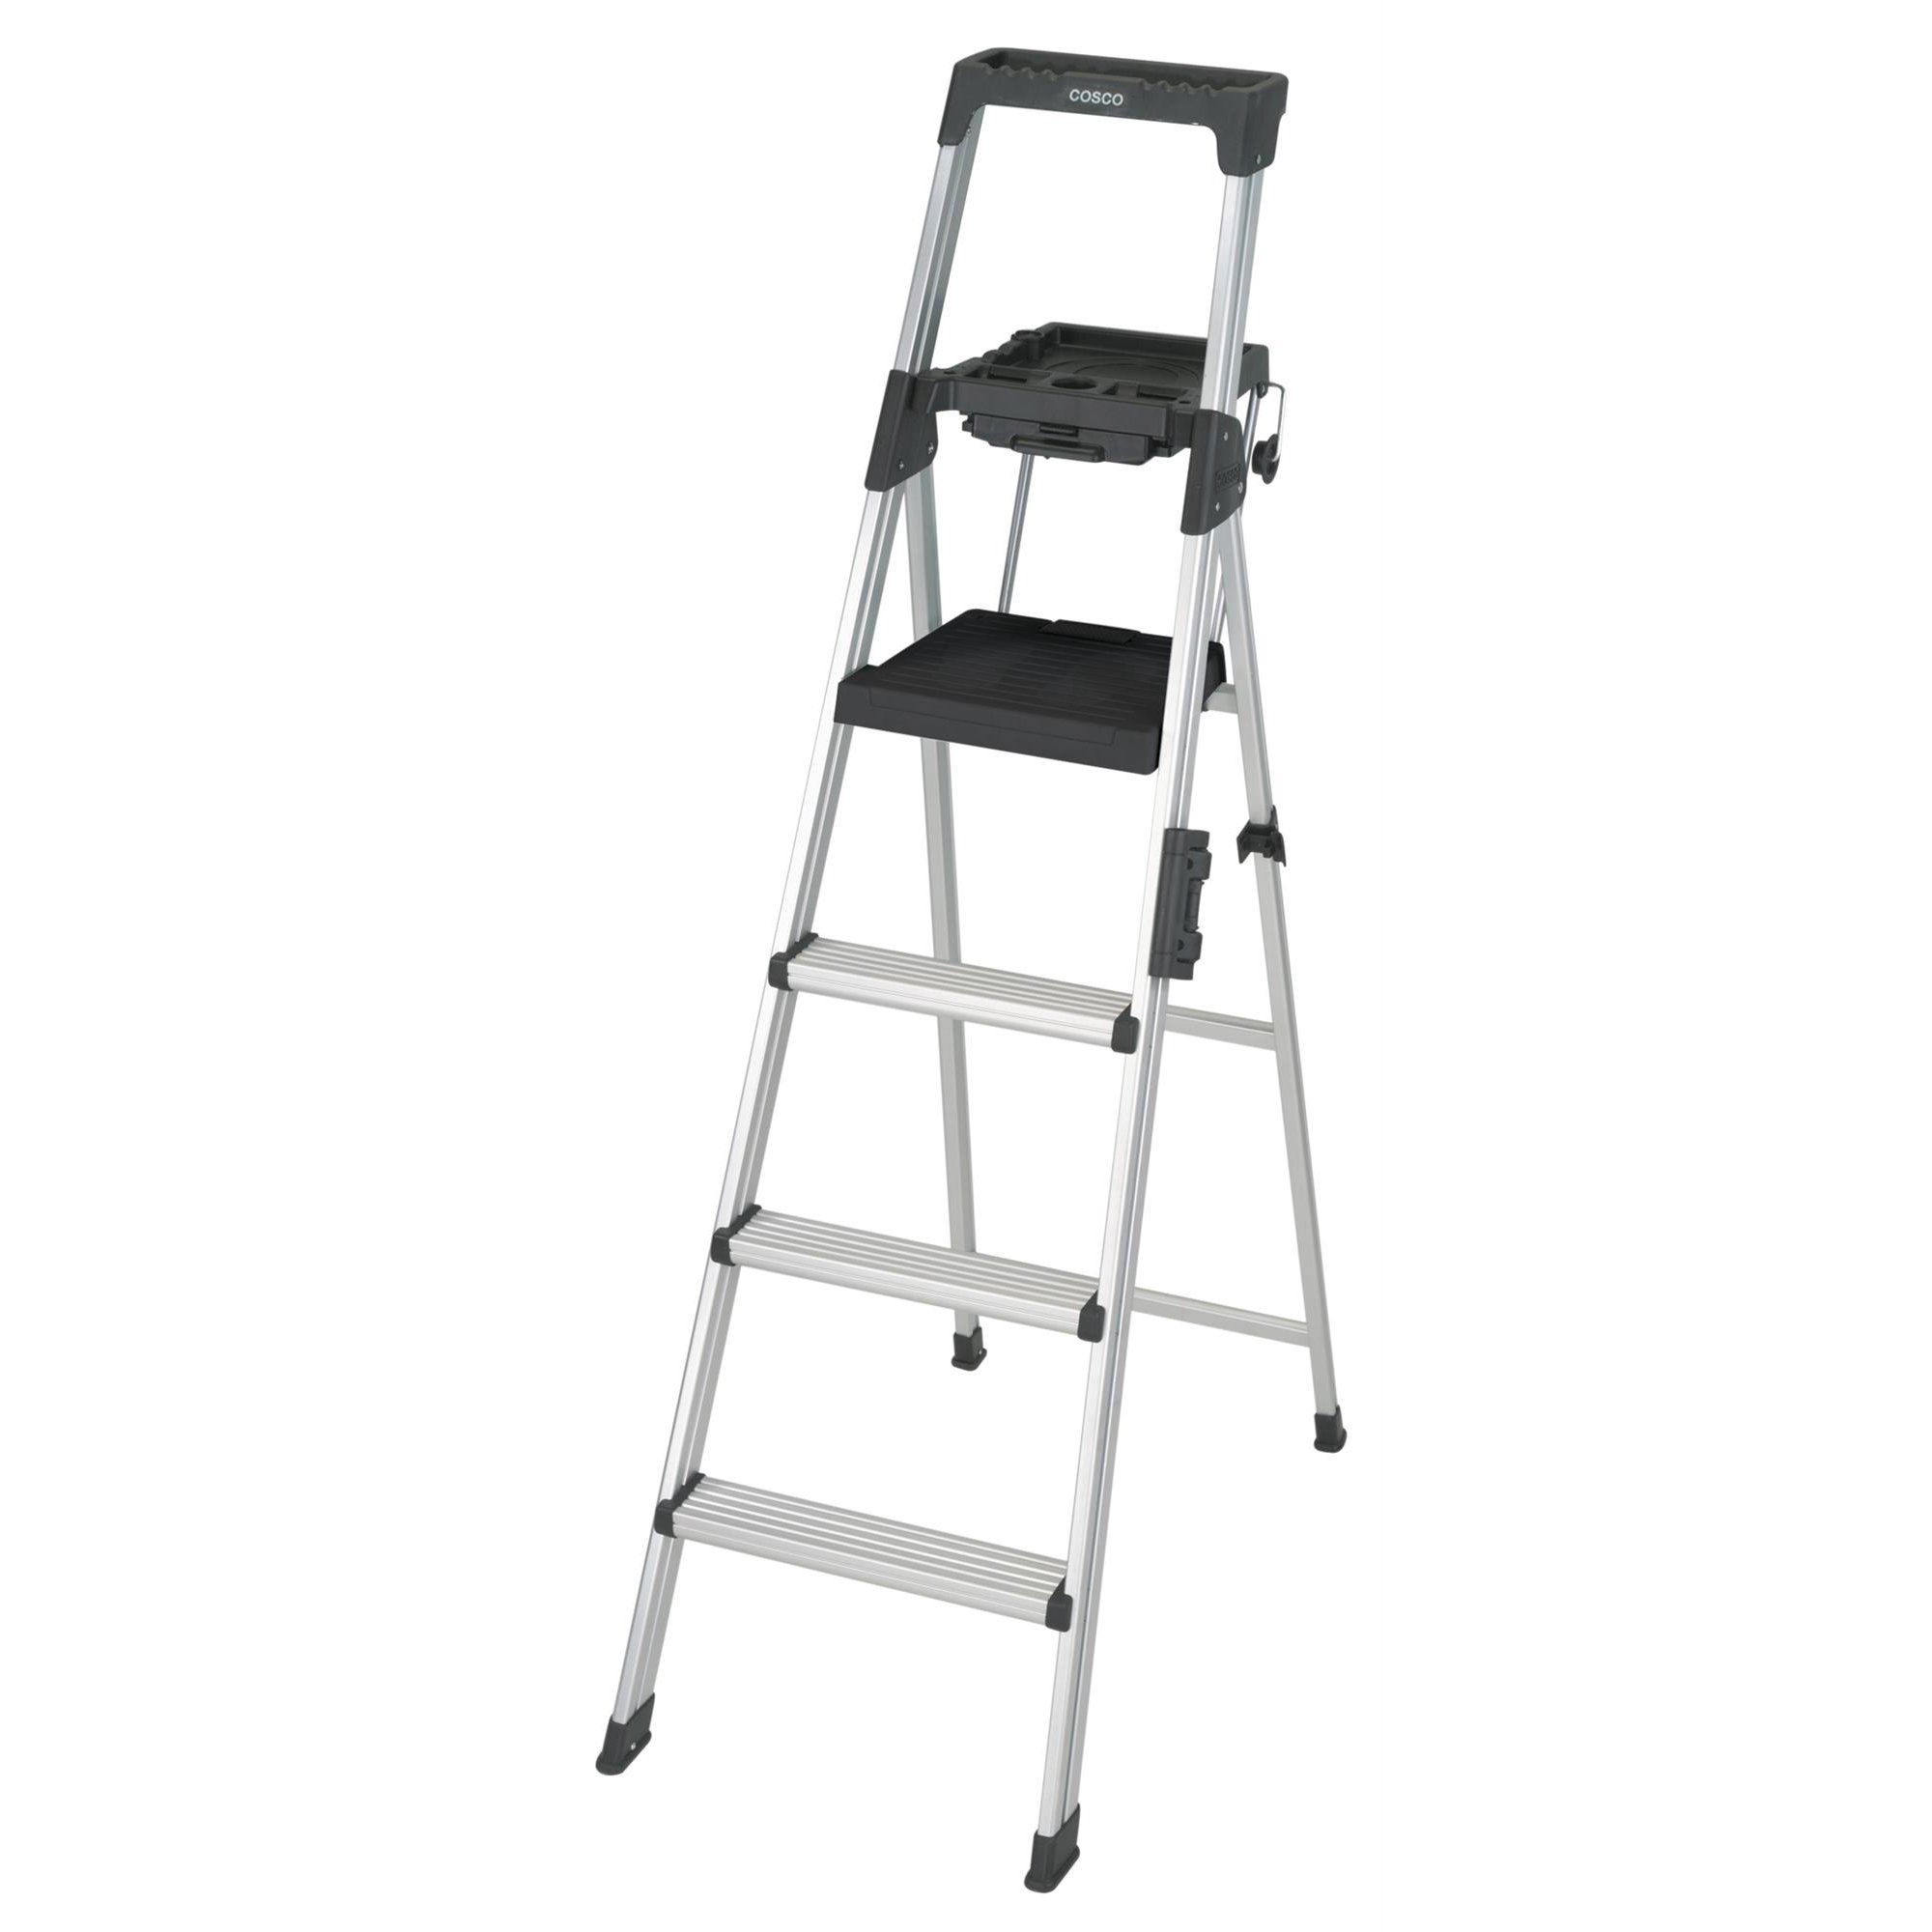 Cosco 6 Ft Signature Series Aluminum Folding Step Ladder With Leg Lock Handle 300 Lb Type Ia Duty Rating Walmart Com In 2020 Step Ladders Pool Ladder Cosco